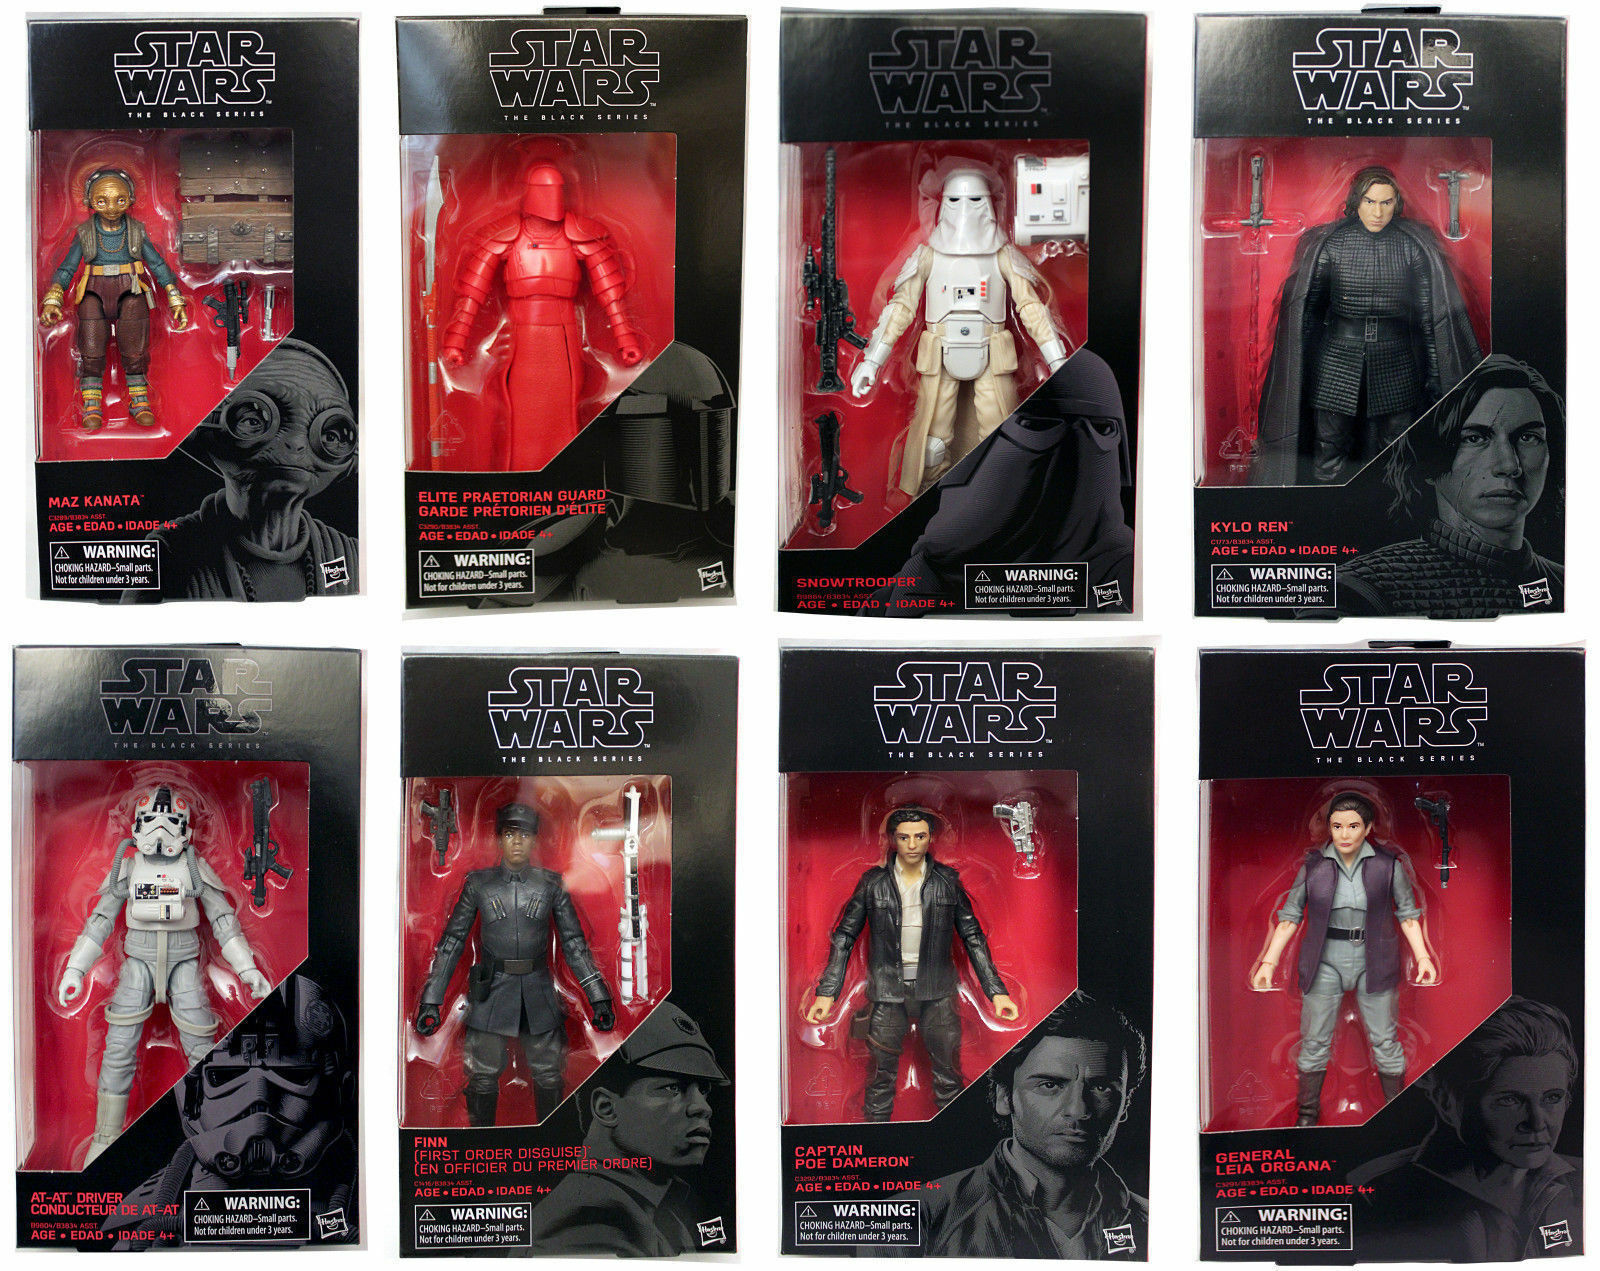 Star Wars Rogue One Noir Série 6   Vague 13  prétorienne, MAZ, Kylo, Finn, Leia